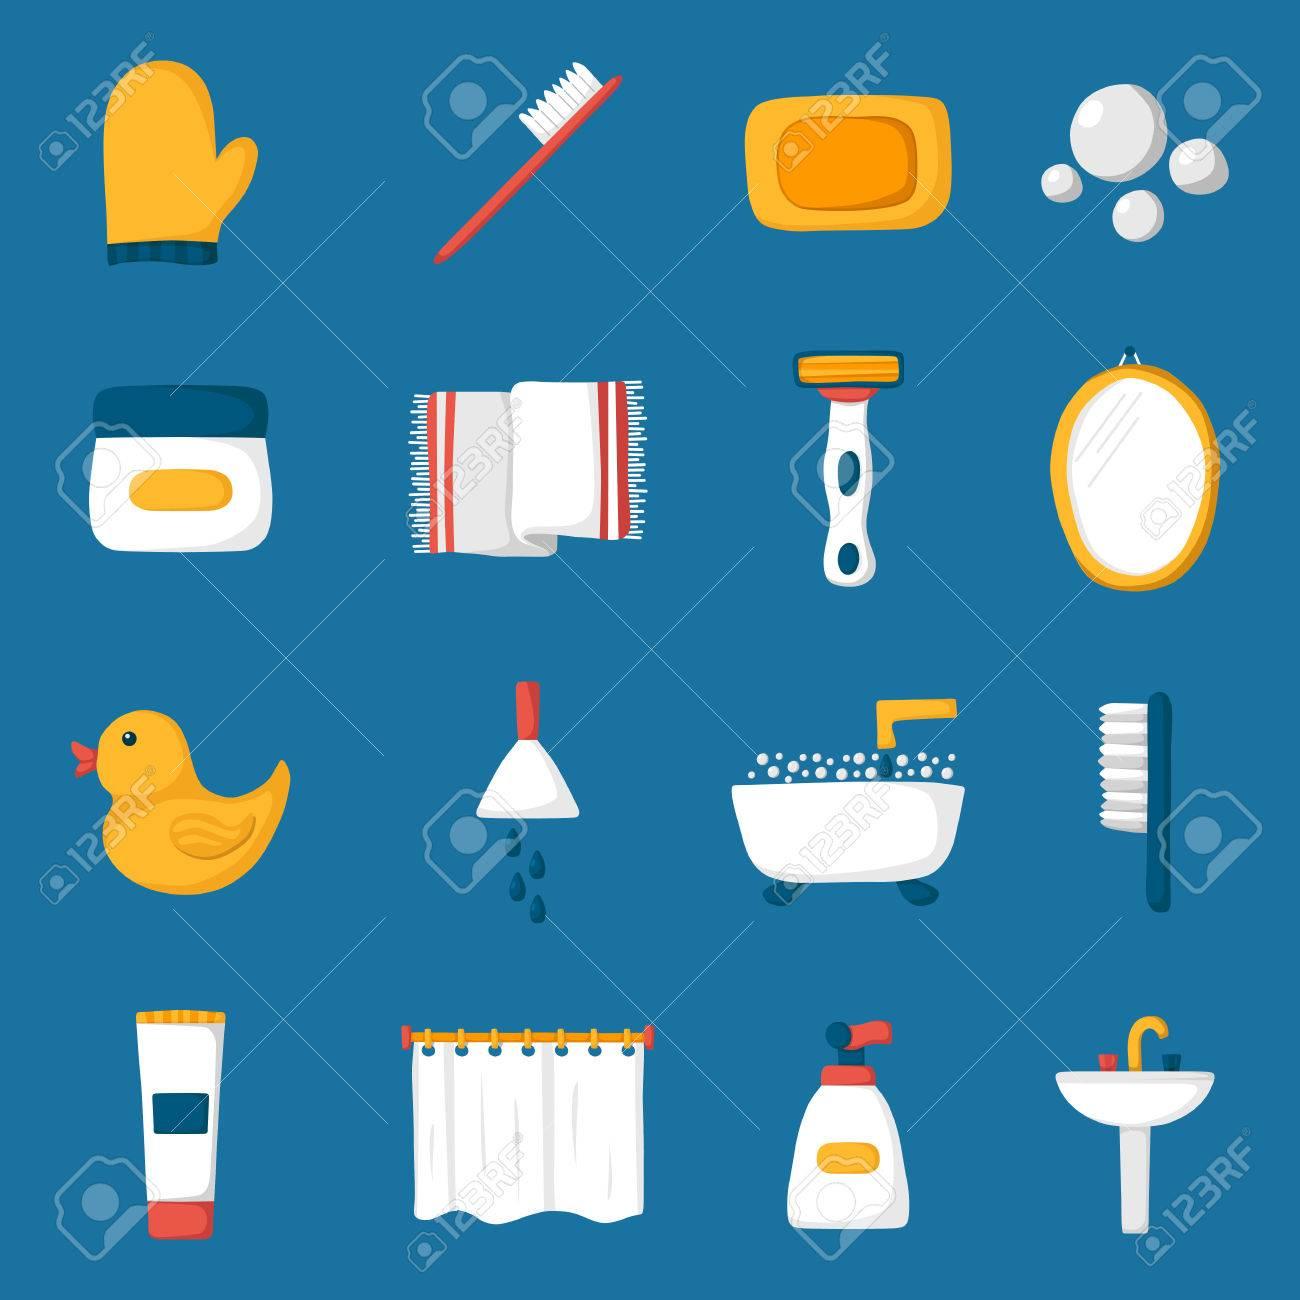 Set Of Cartoon Bathroom Icons: Bath, Duck, Toothbrush, Towel ... for Bathroom Sink Toothbrush Clipart  lp0lpmzq